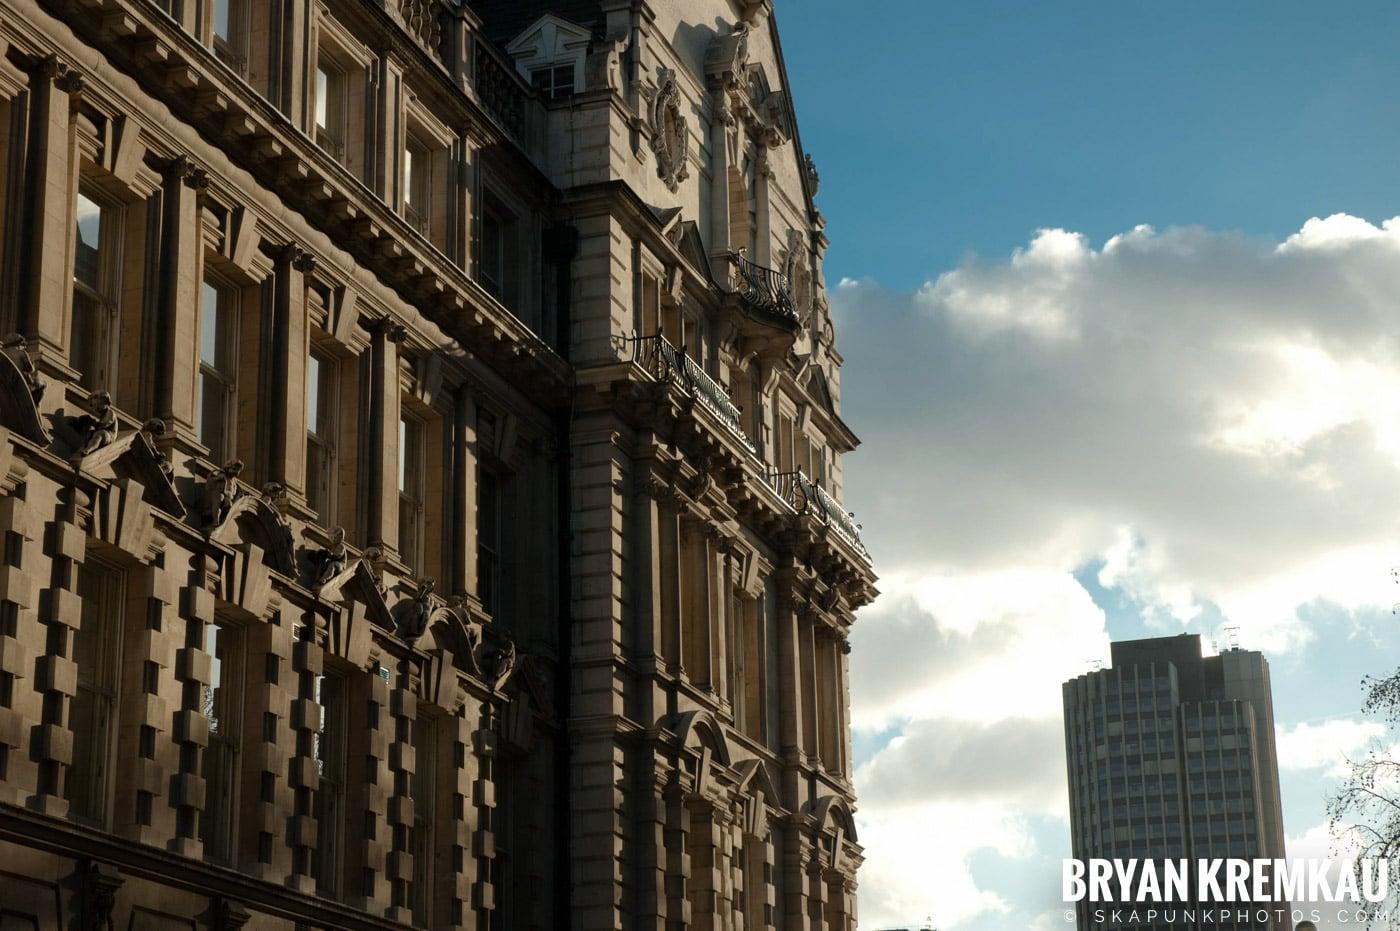 London, England - Day 2 - 12.9.06 (8)